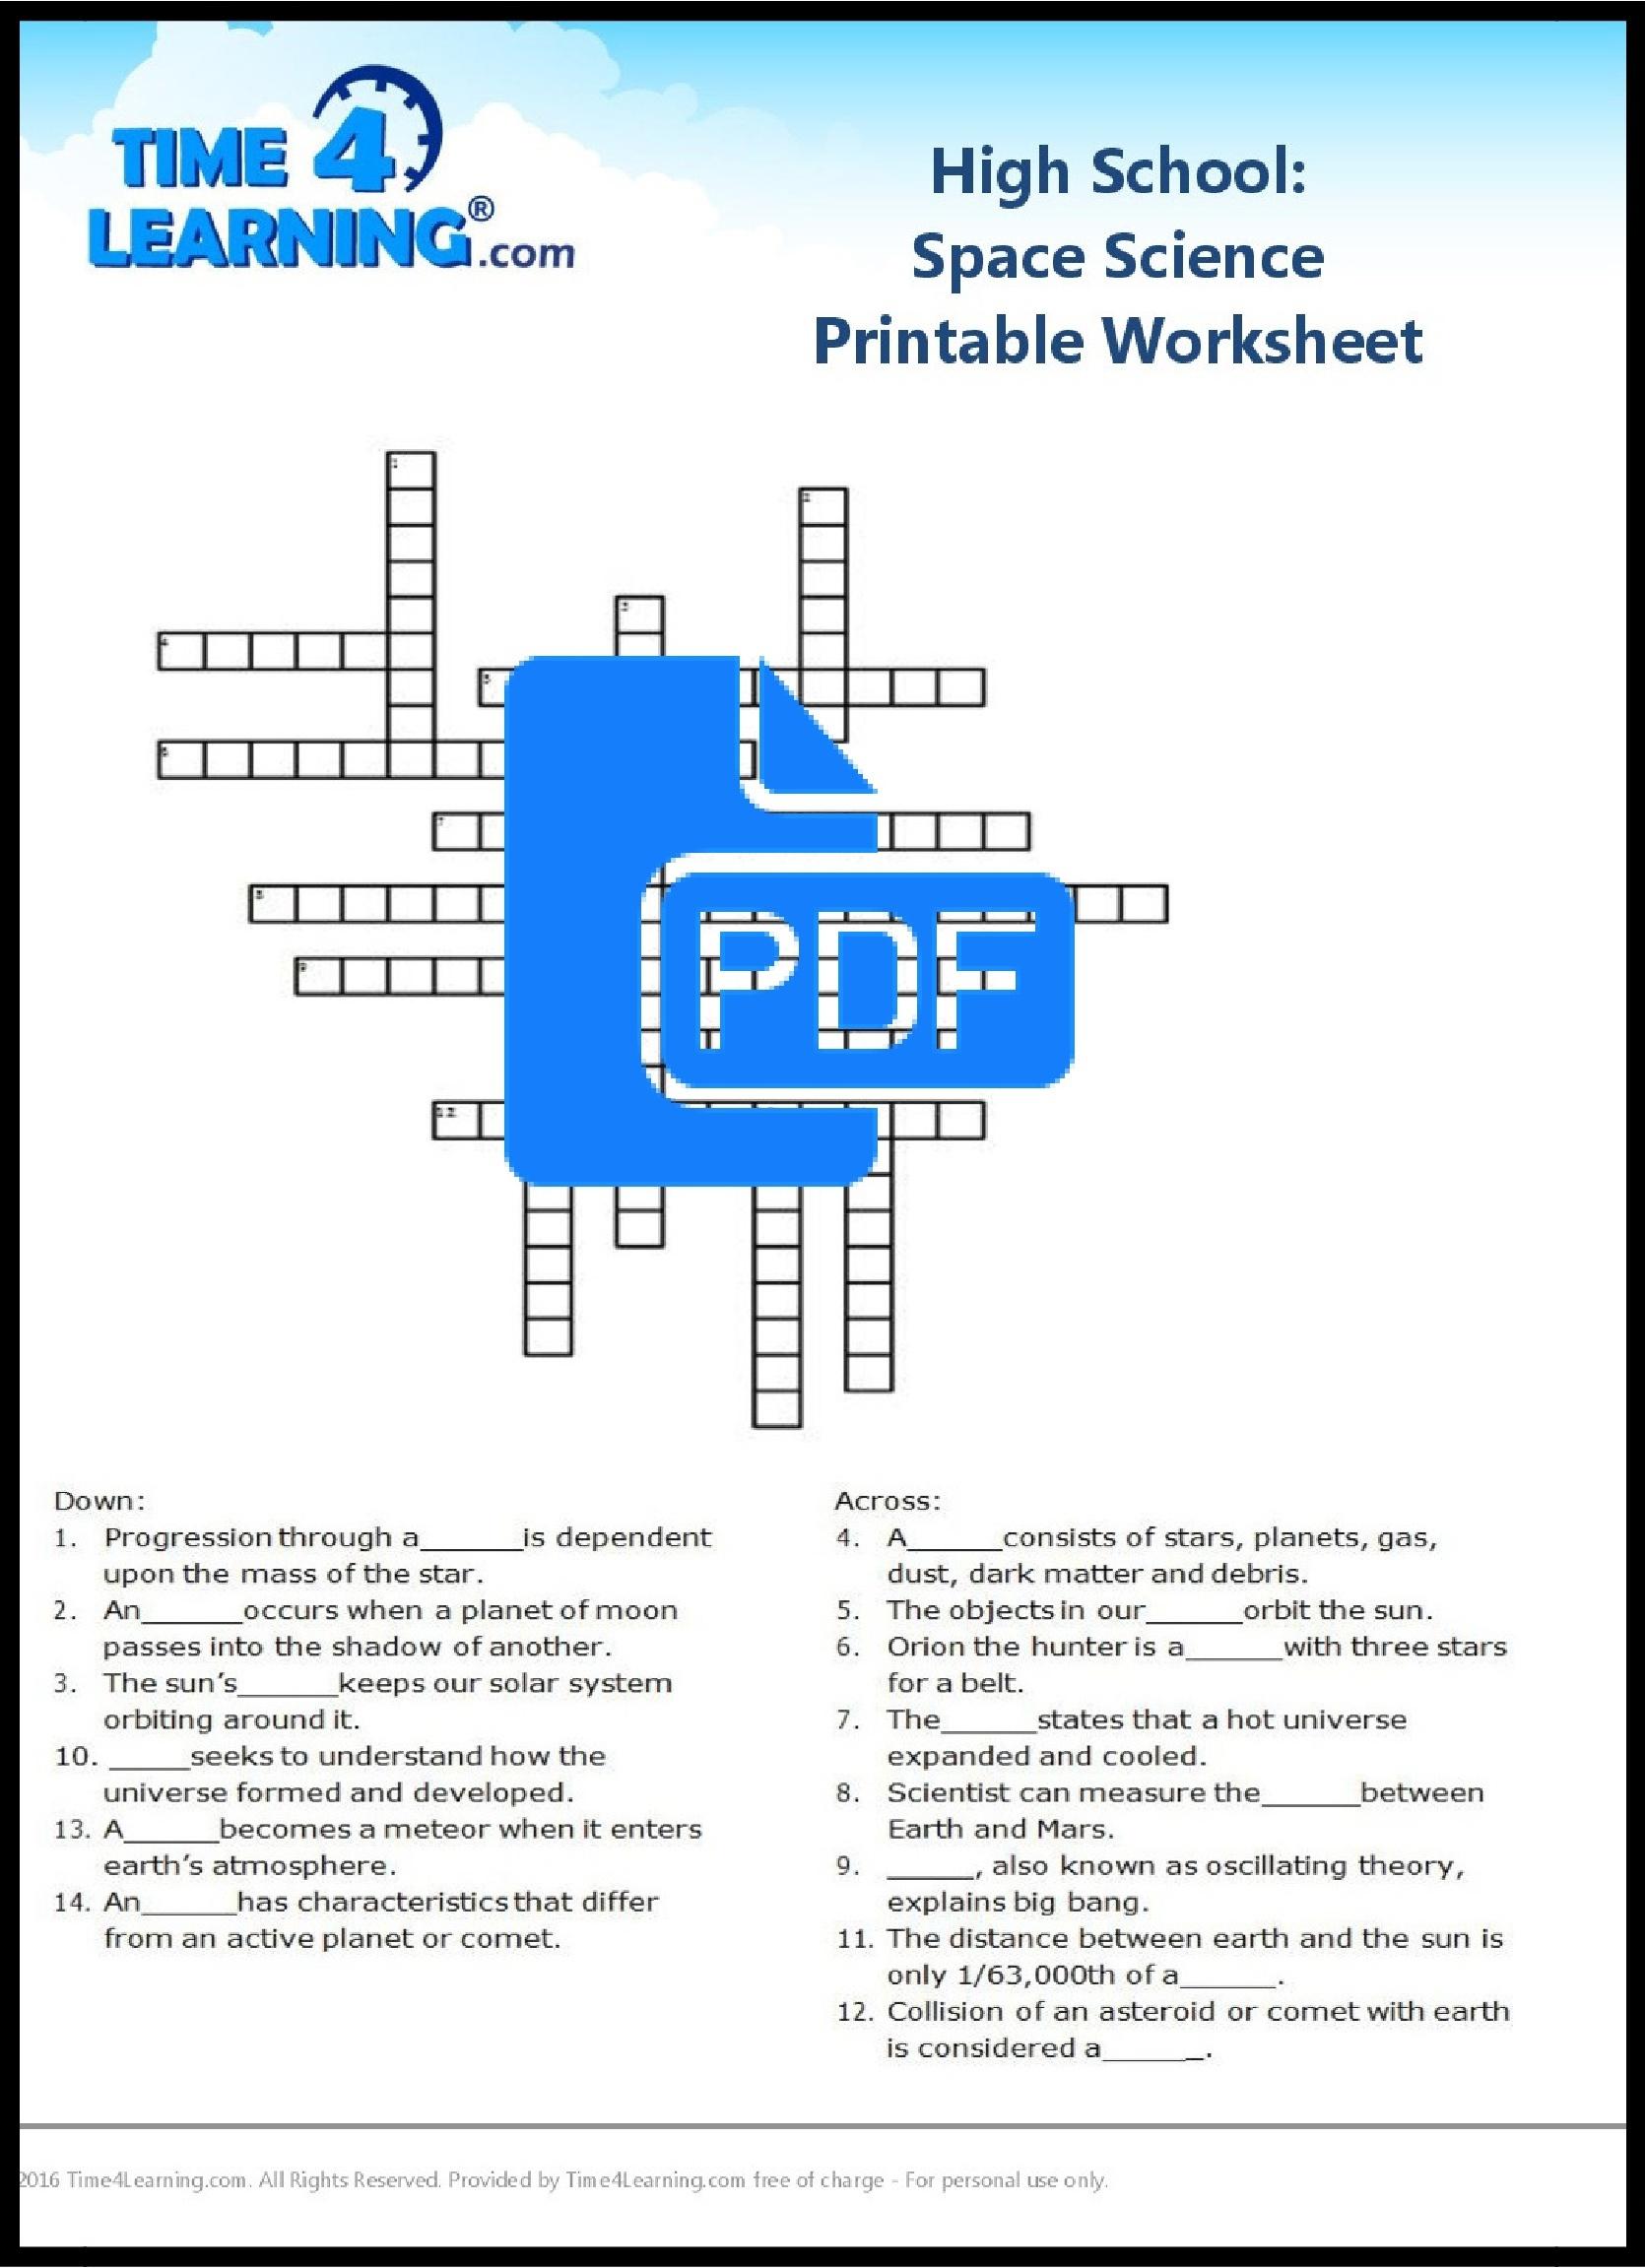 Free Printable: High School Space Science Worksheet | Time4Learning - Free Printable High School Worksheets